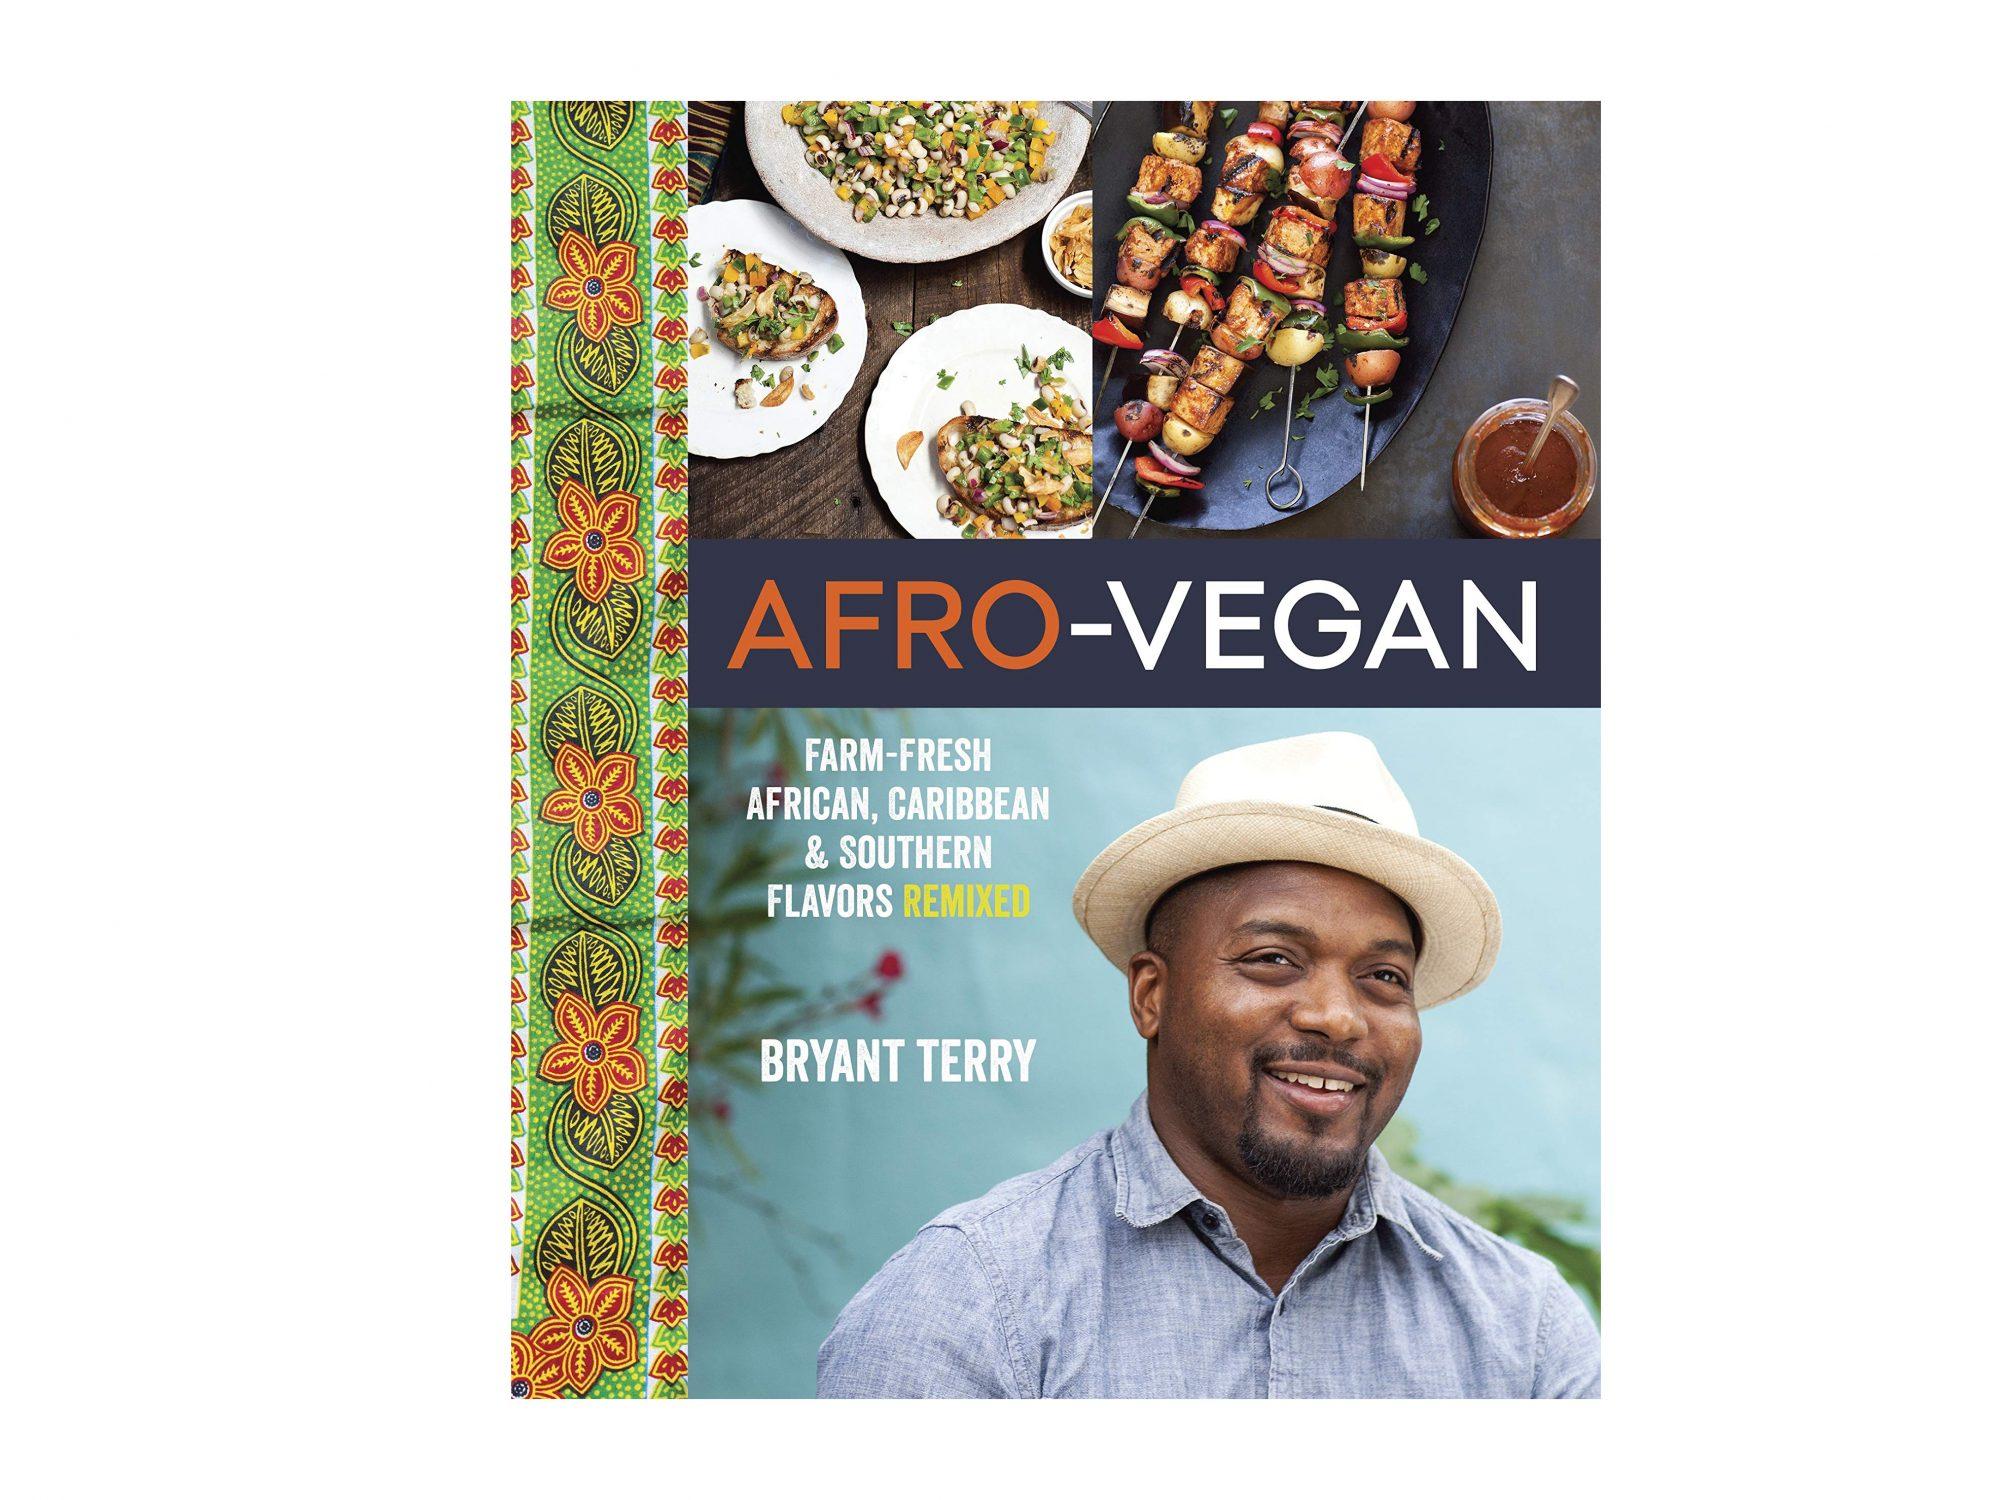 afro-vegan.jpg